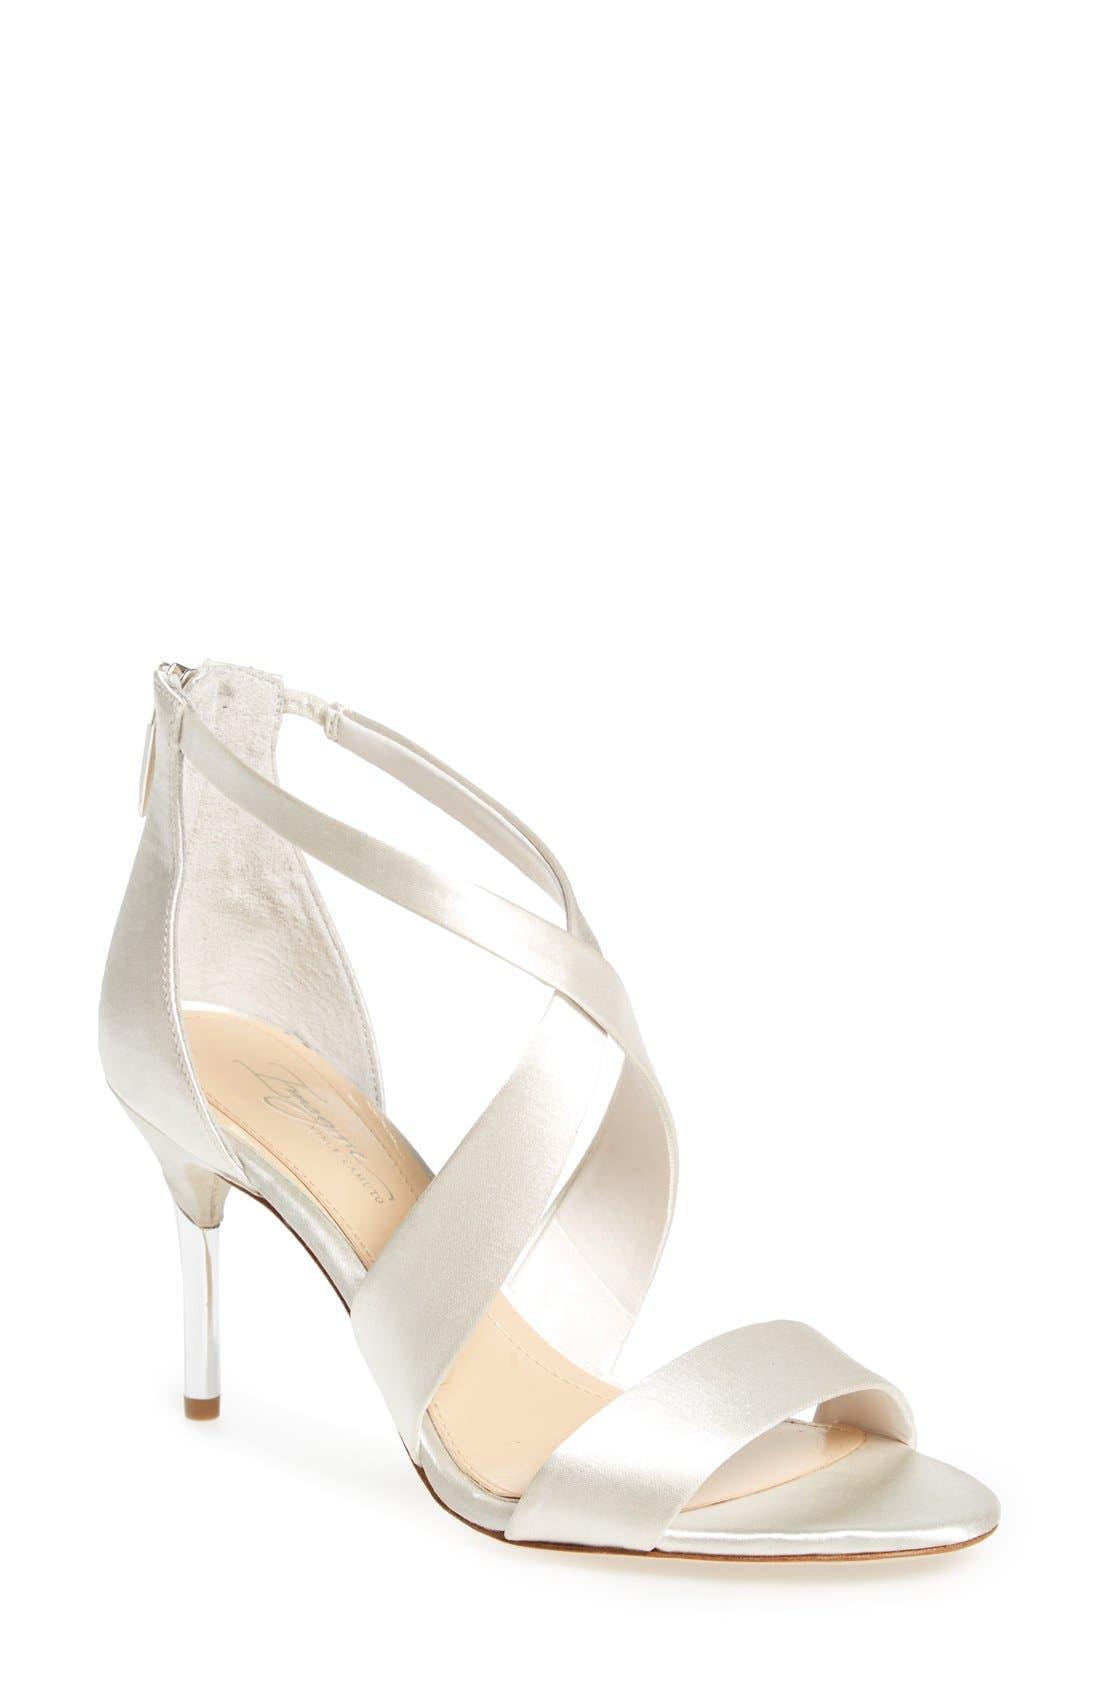 Imagine by Vince Camuto 'Pascal' Sandal (Women)